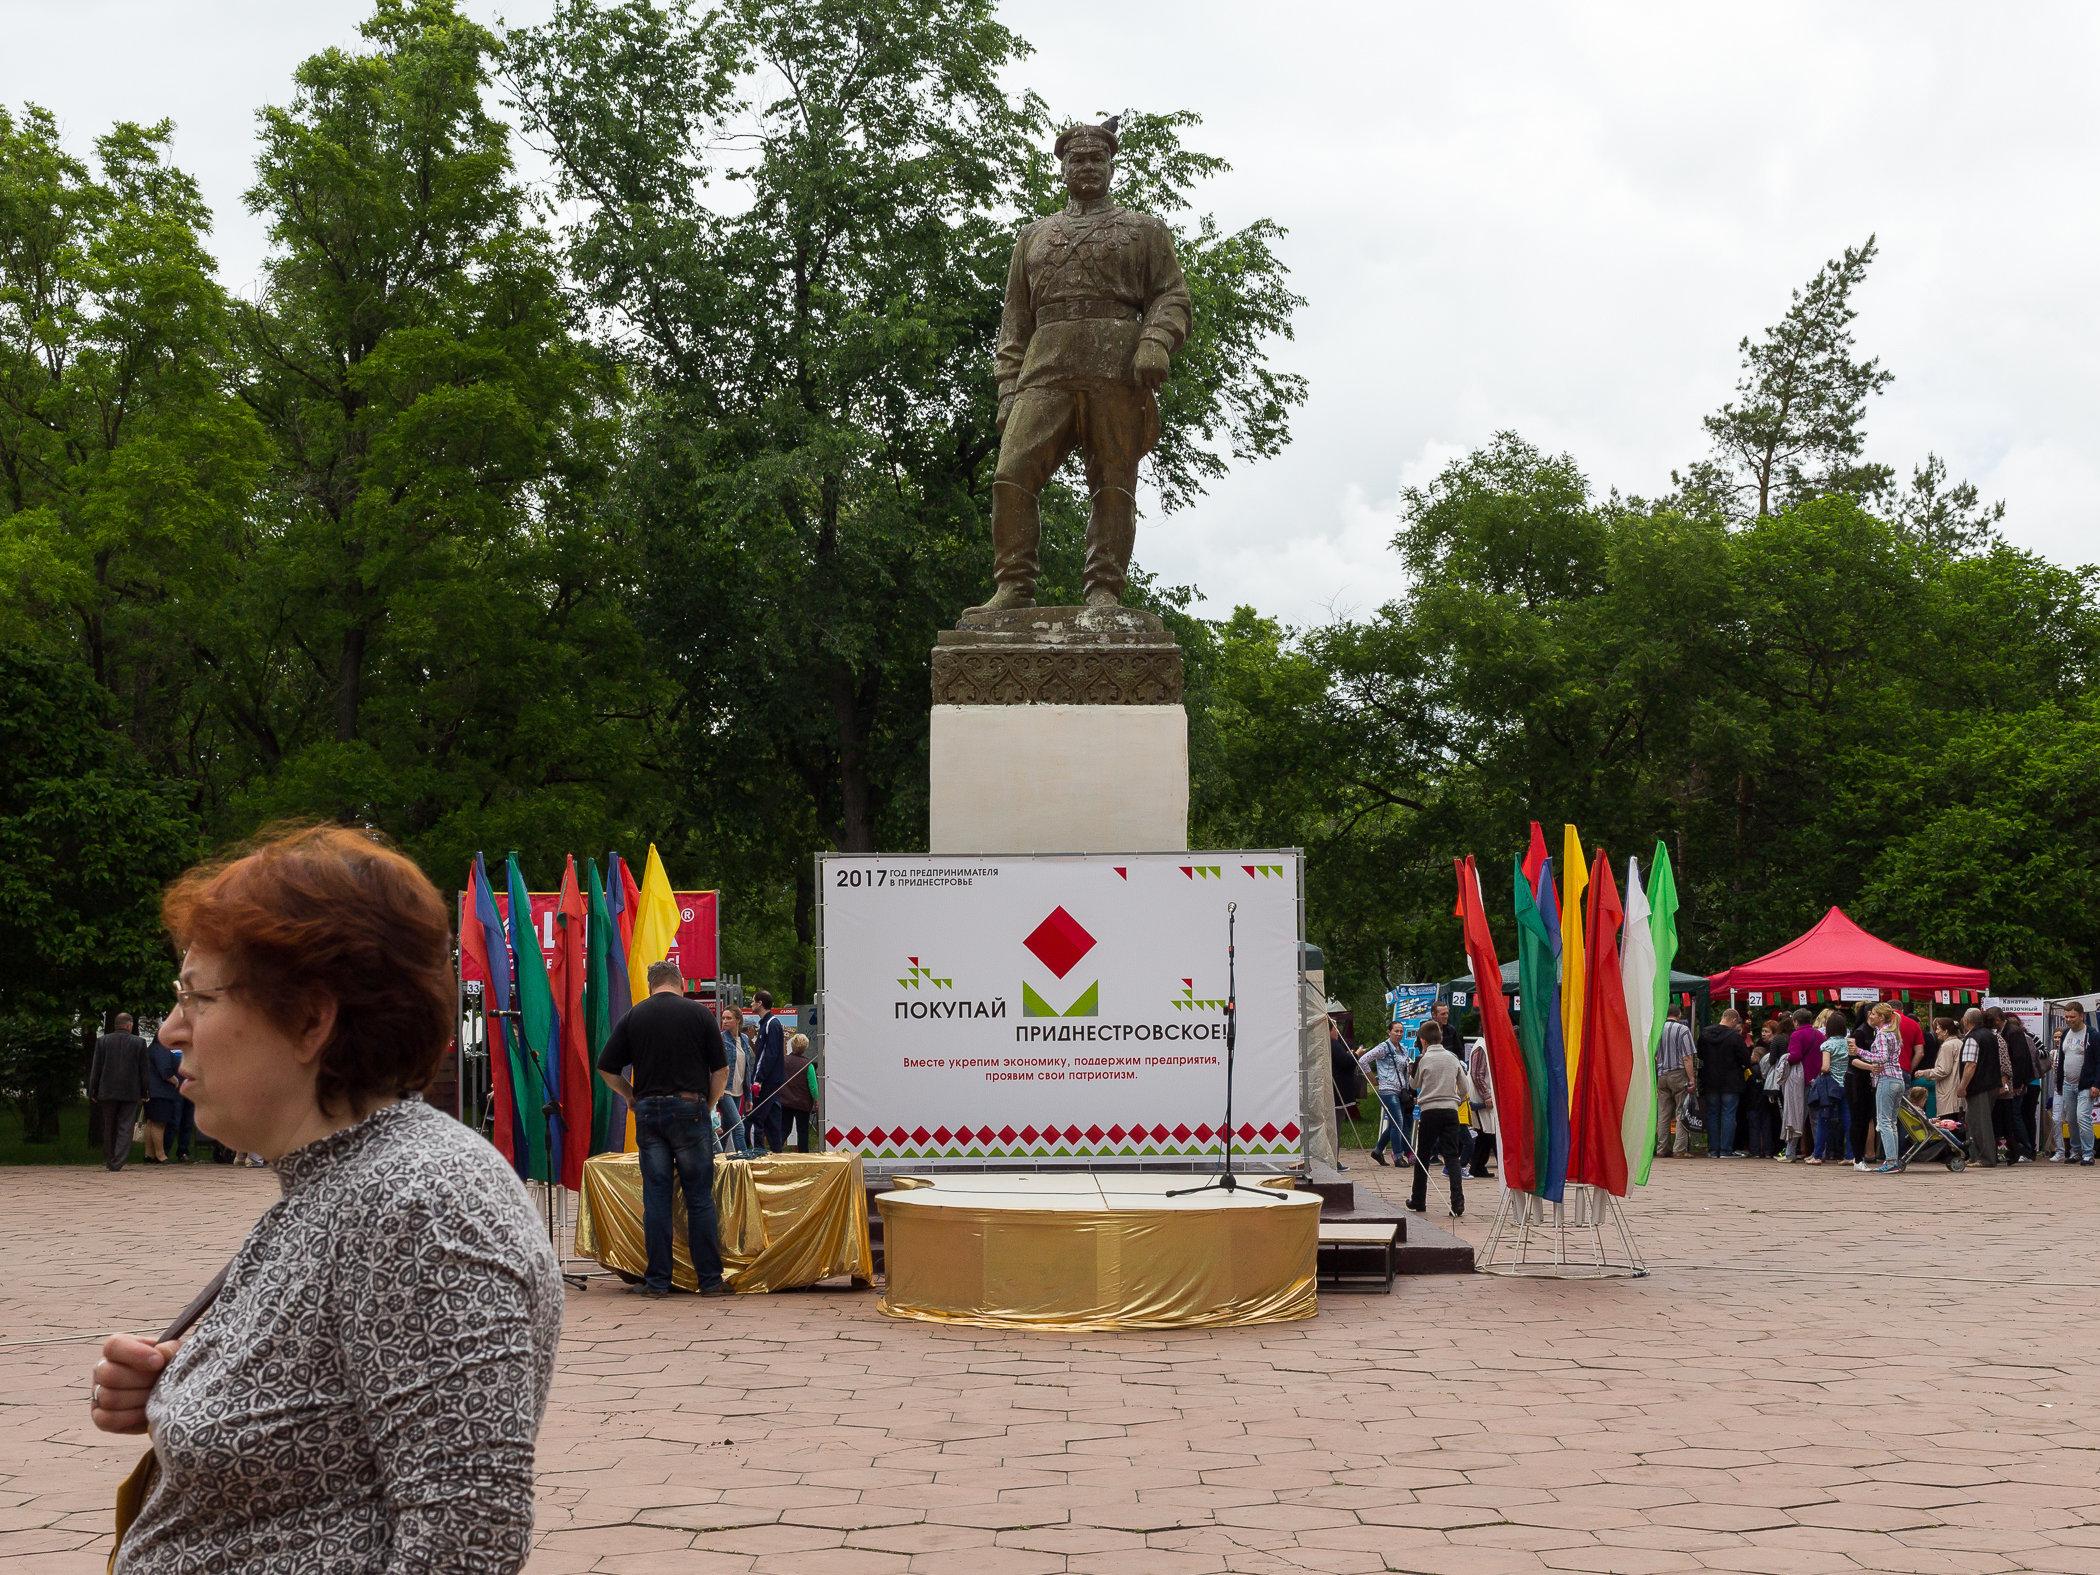 Buy Transnistrian!